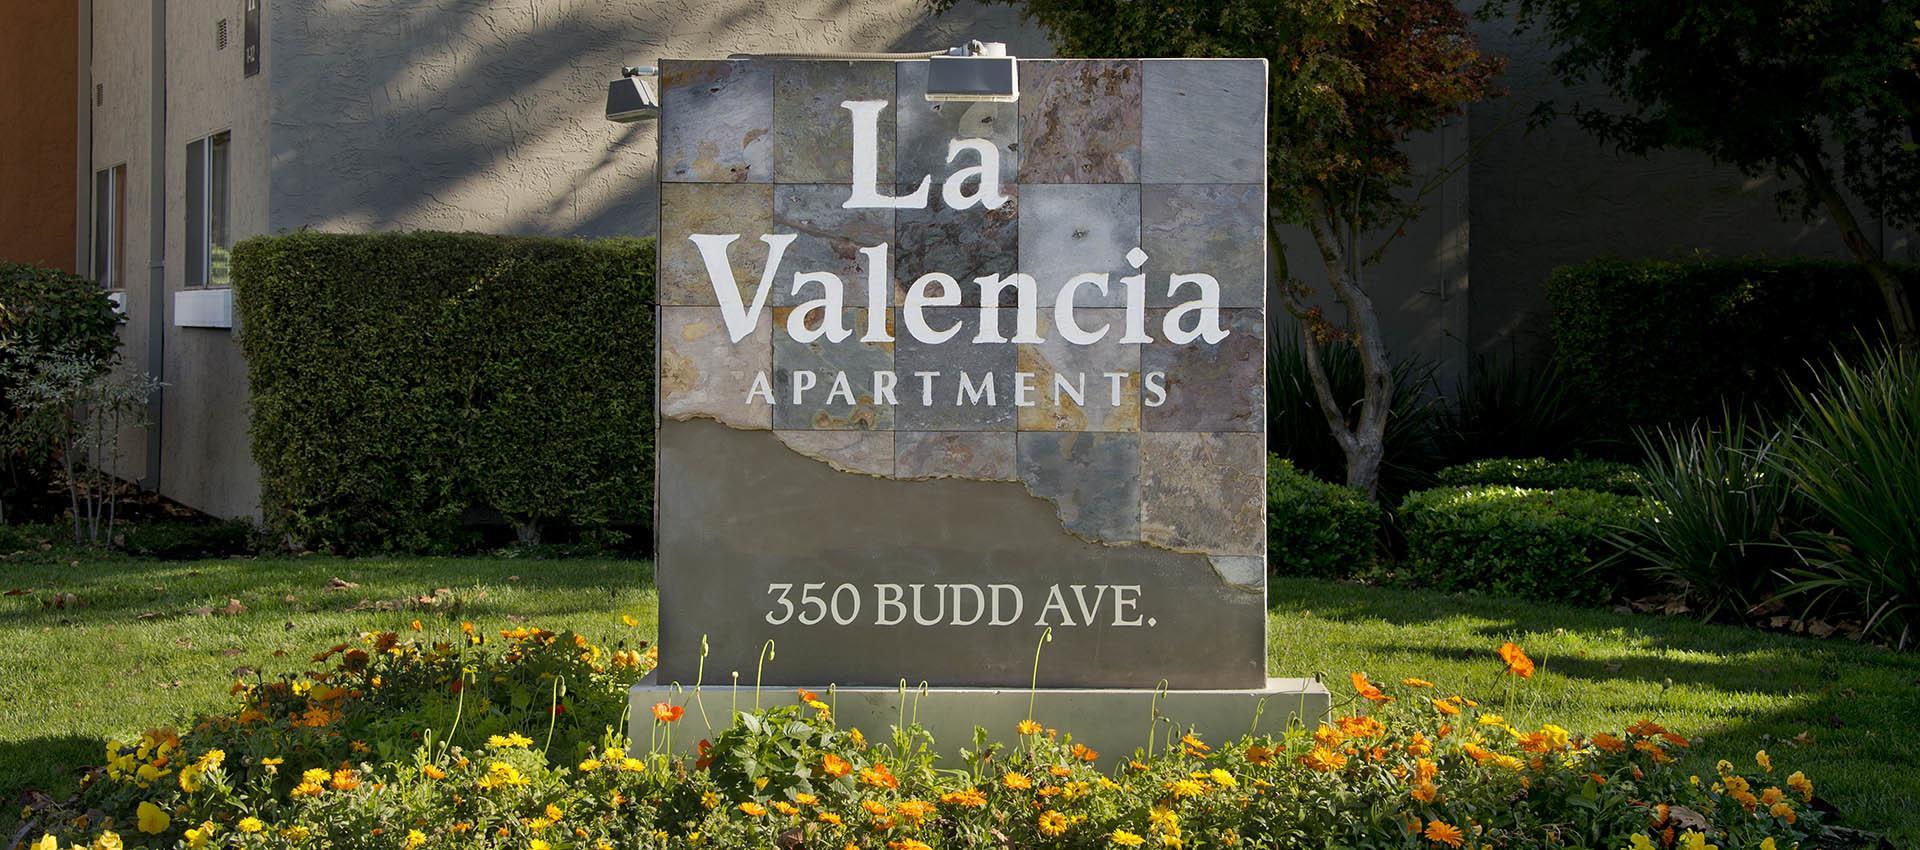 Signage at La Valencia Apartment Homes in Campbell, CA